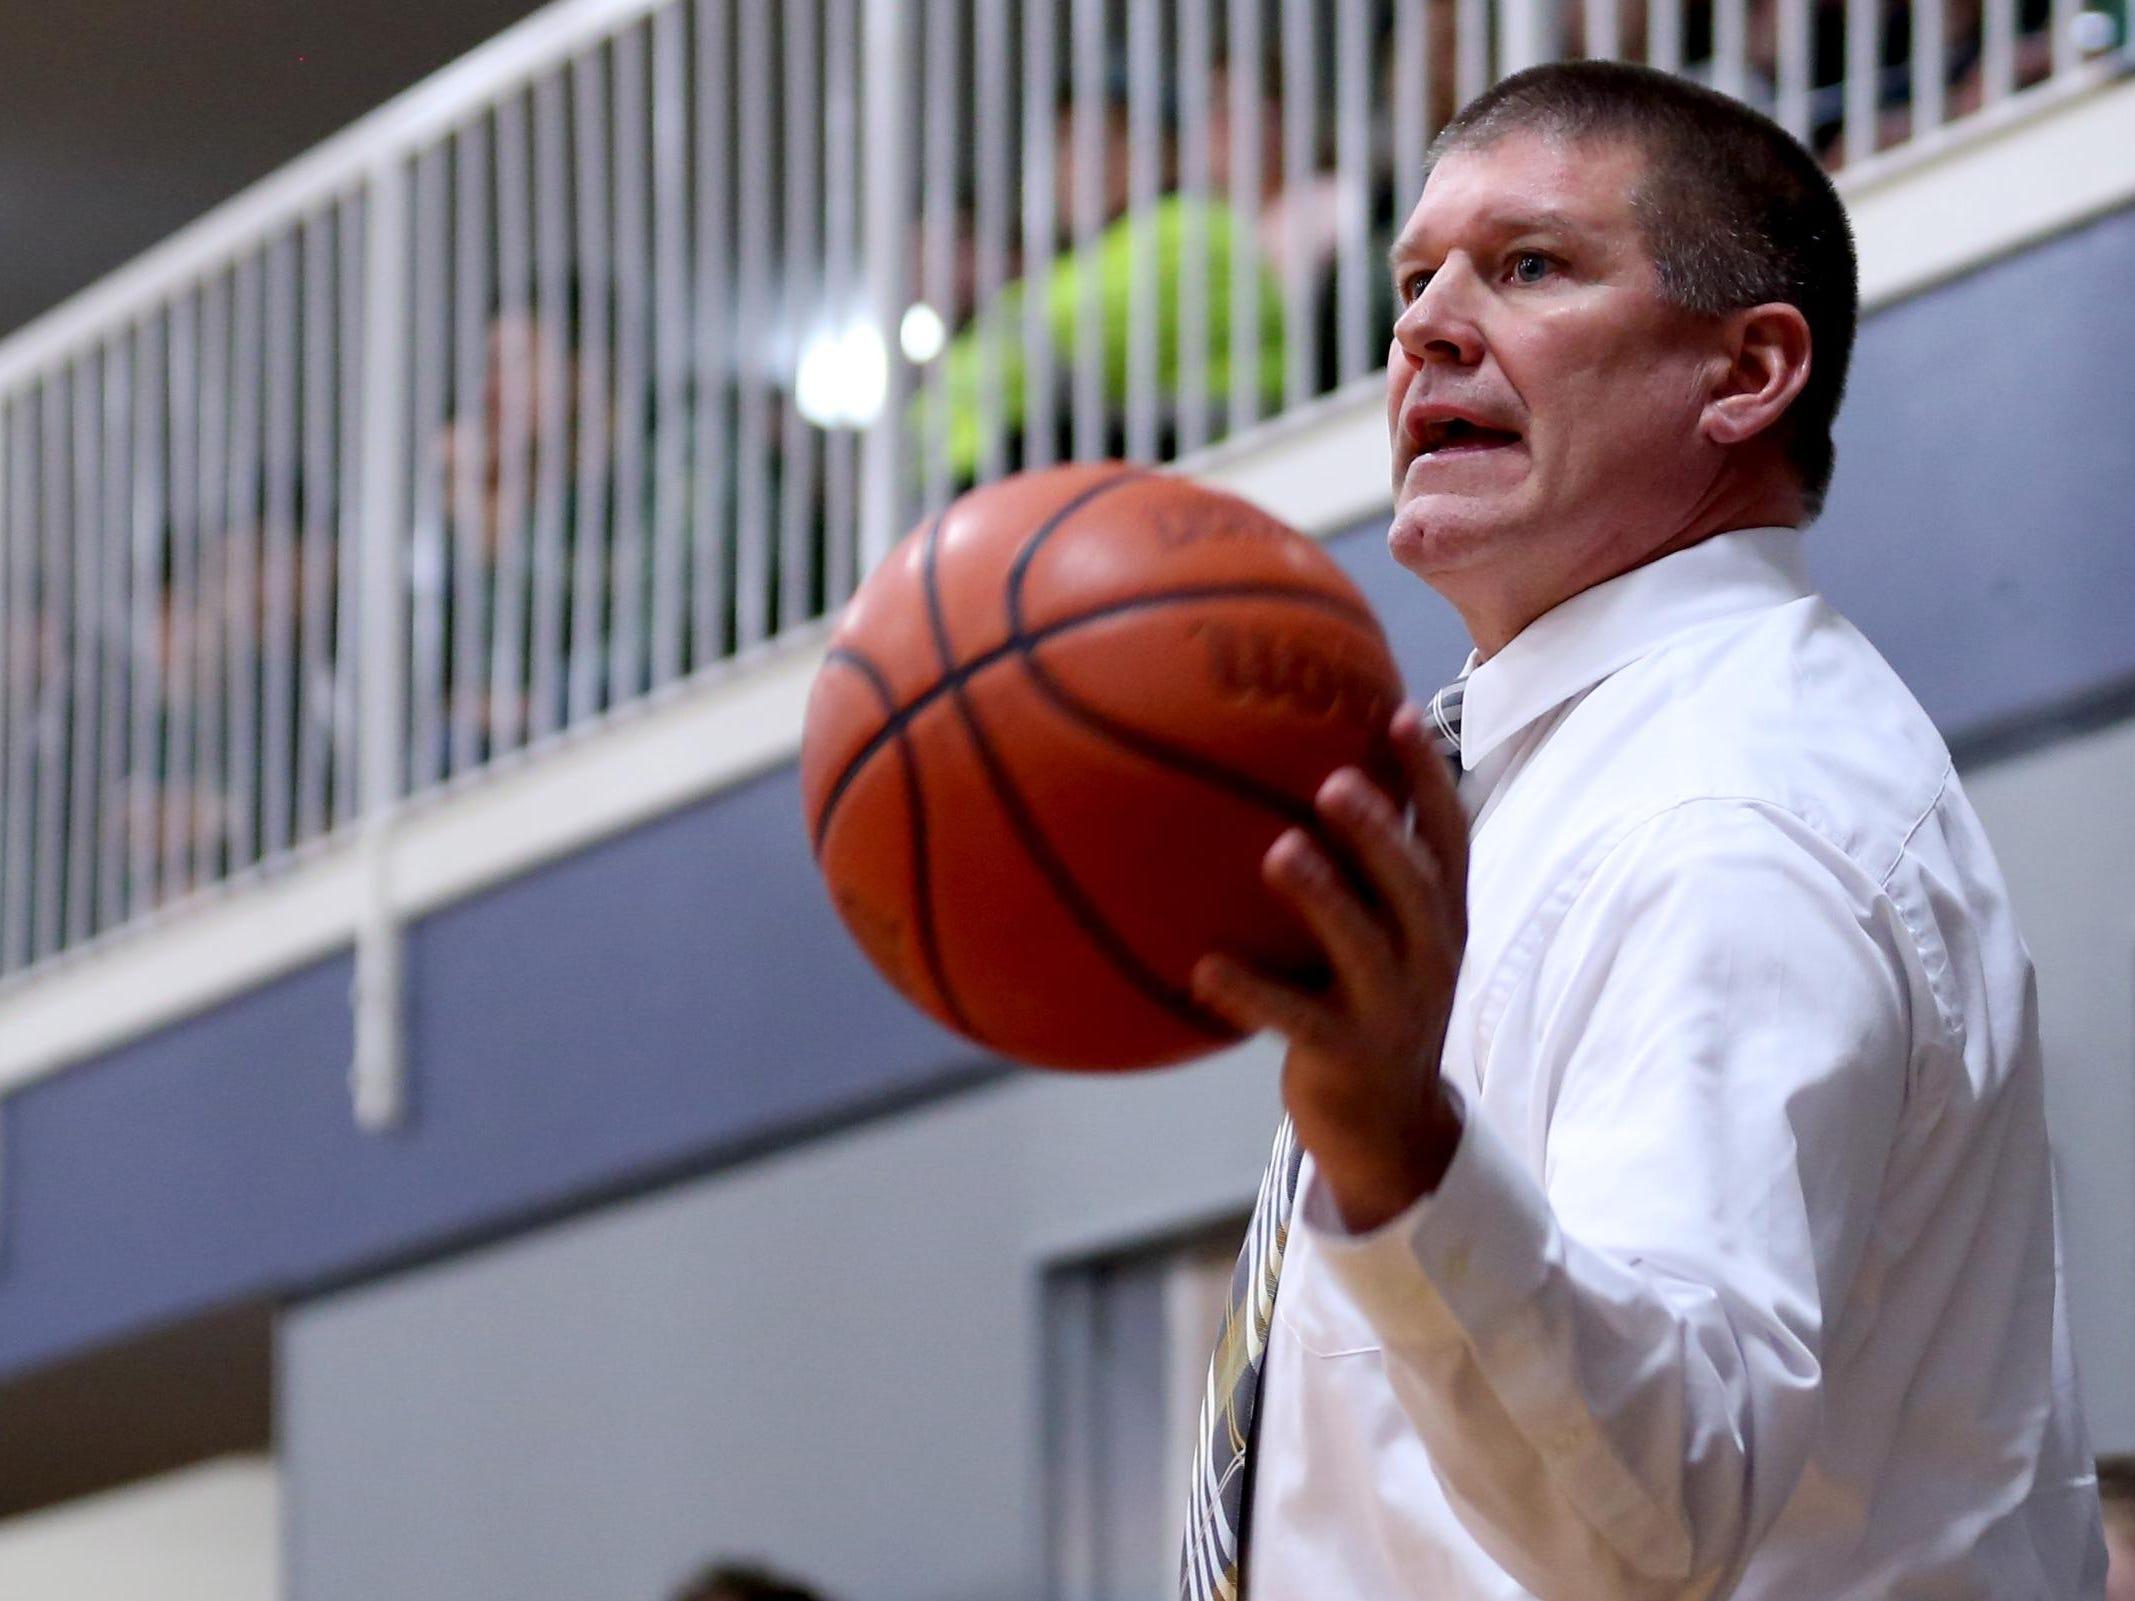 Regis head coach Stuart Alley puts the ball back in play in the Regis vs. Western Mennonite girl's basketball game at Western Mennonite High School on Wednesday, Feb. 17, 2016.